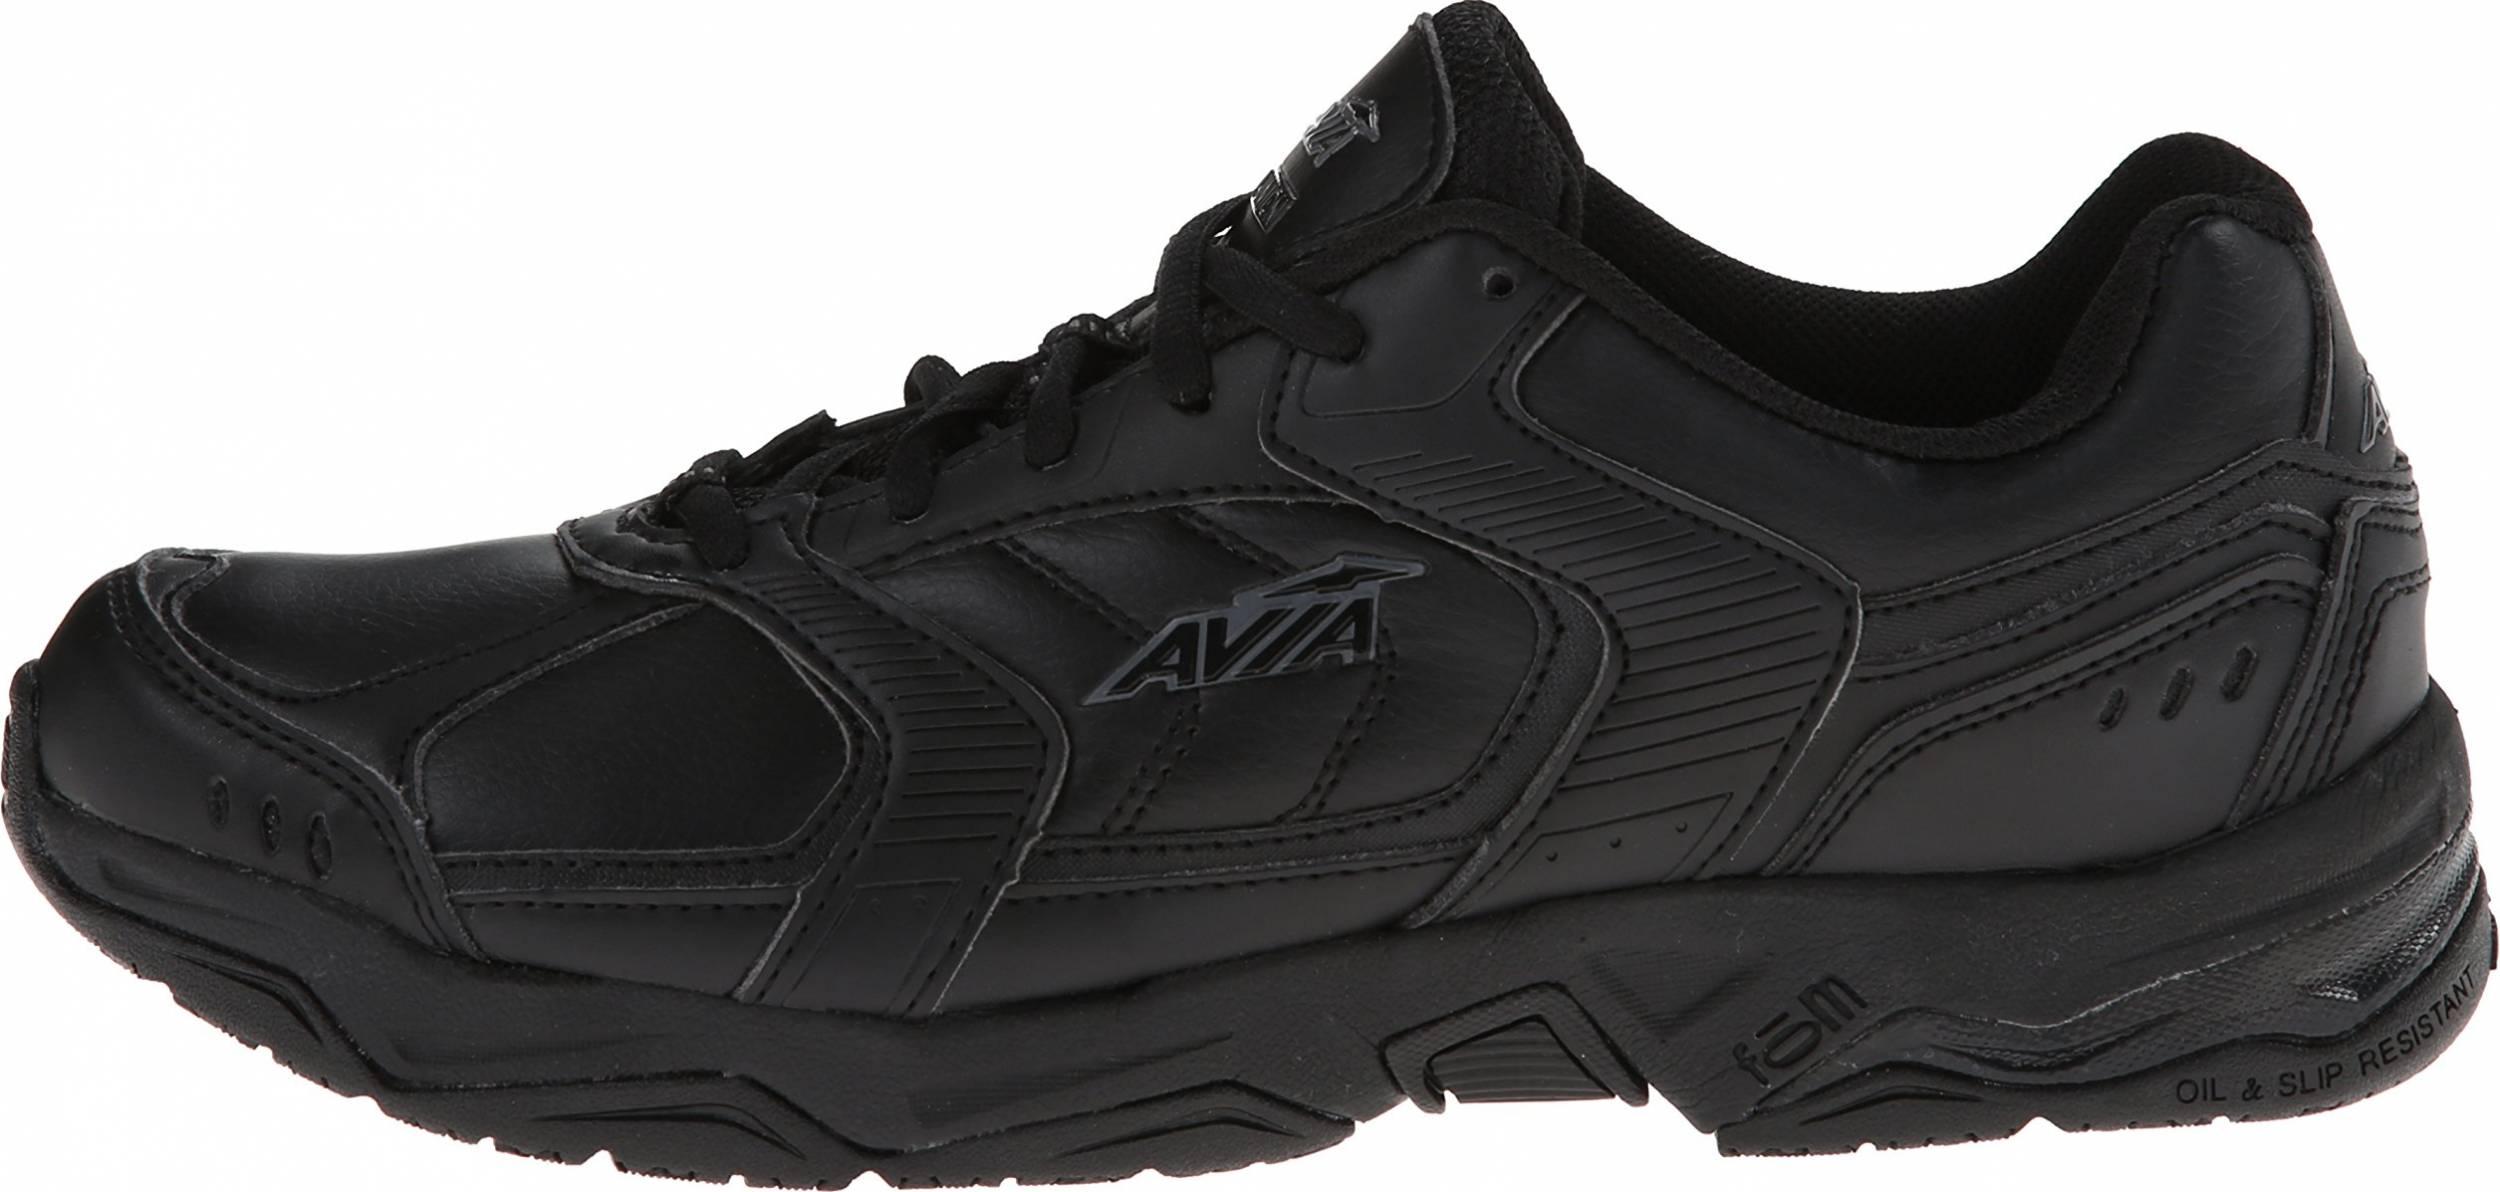 Most Comfortable Non-Slip Shoes